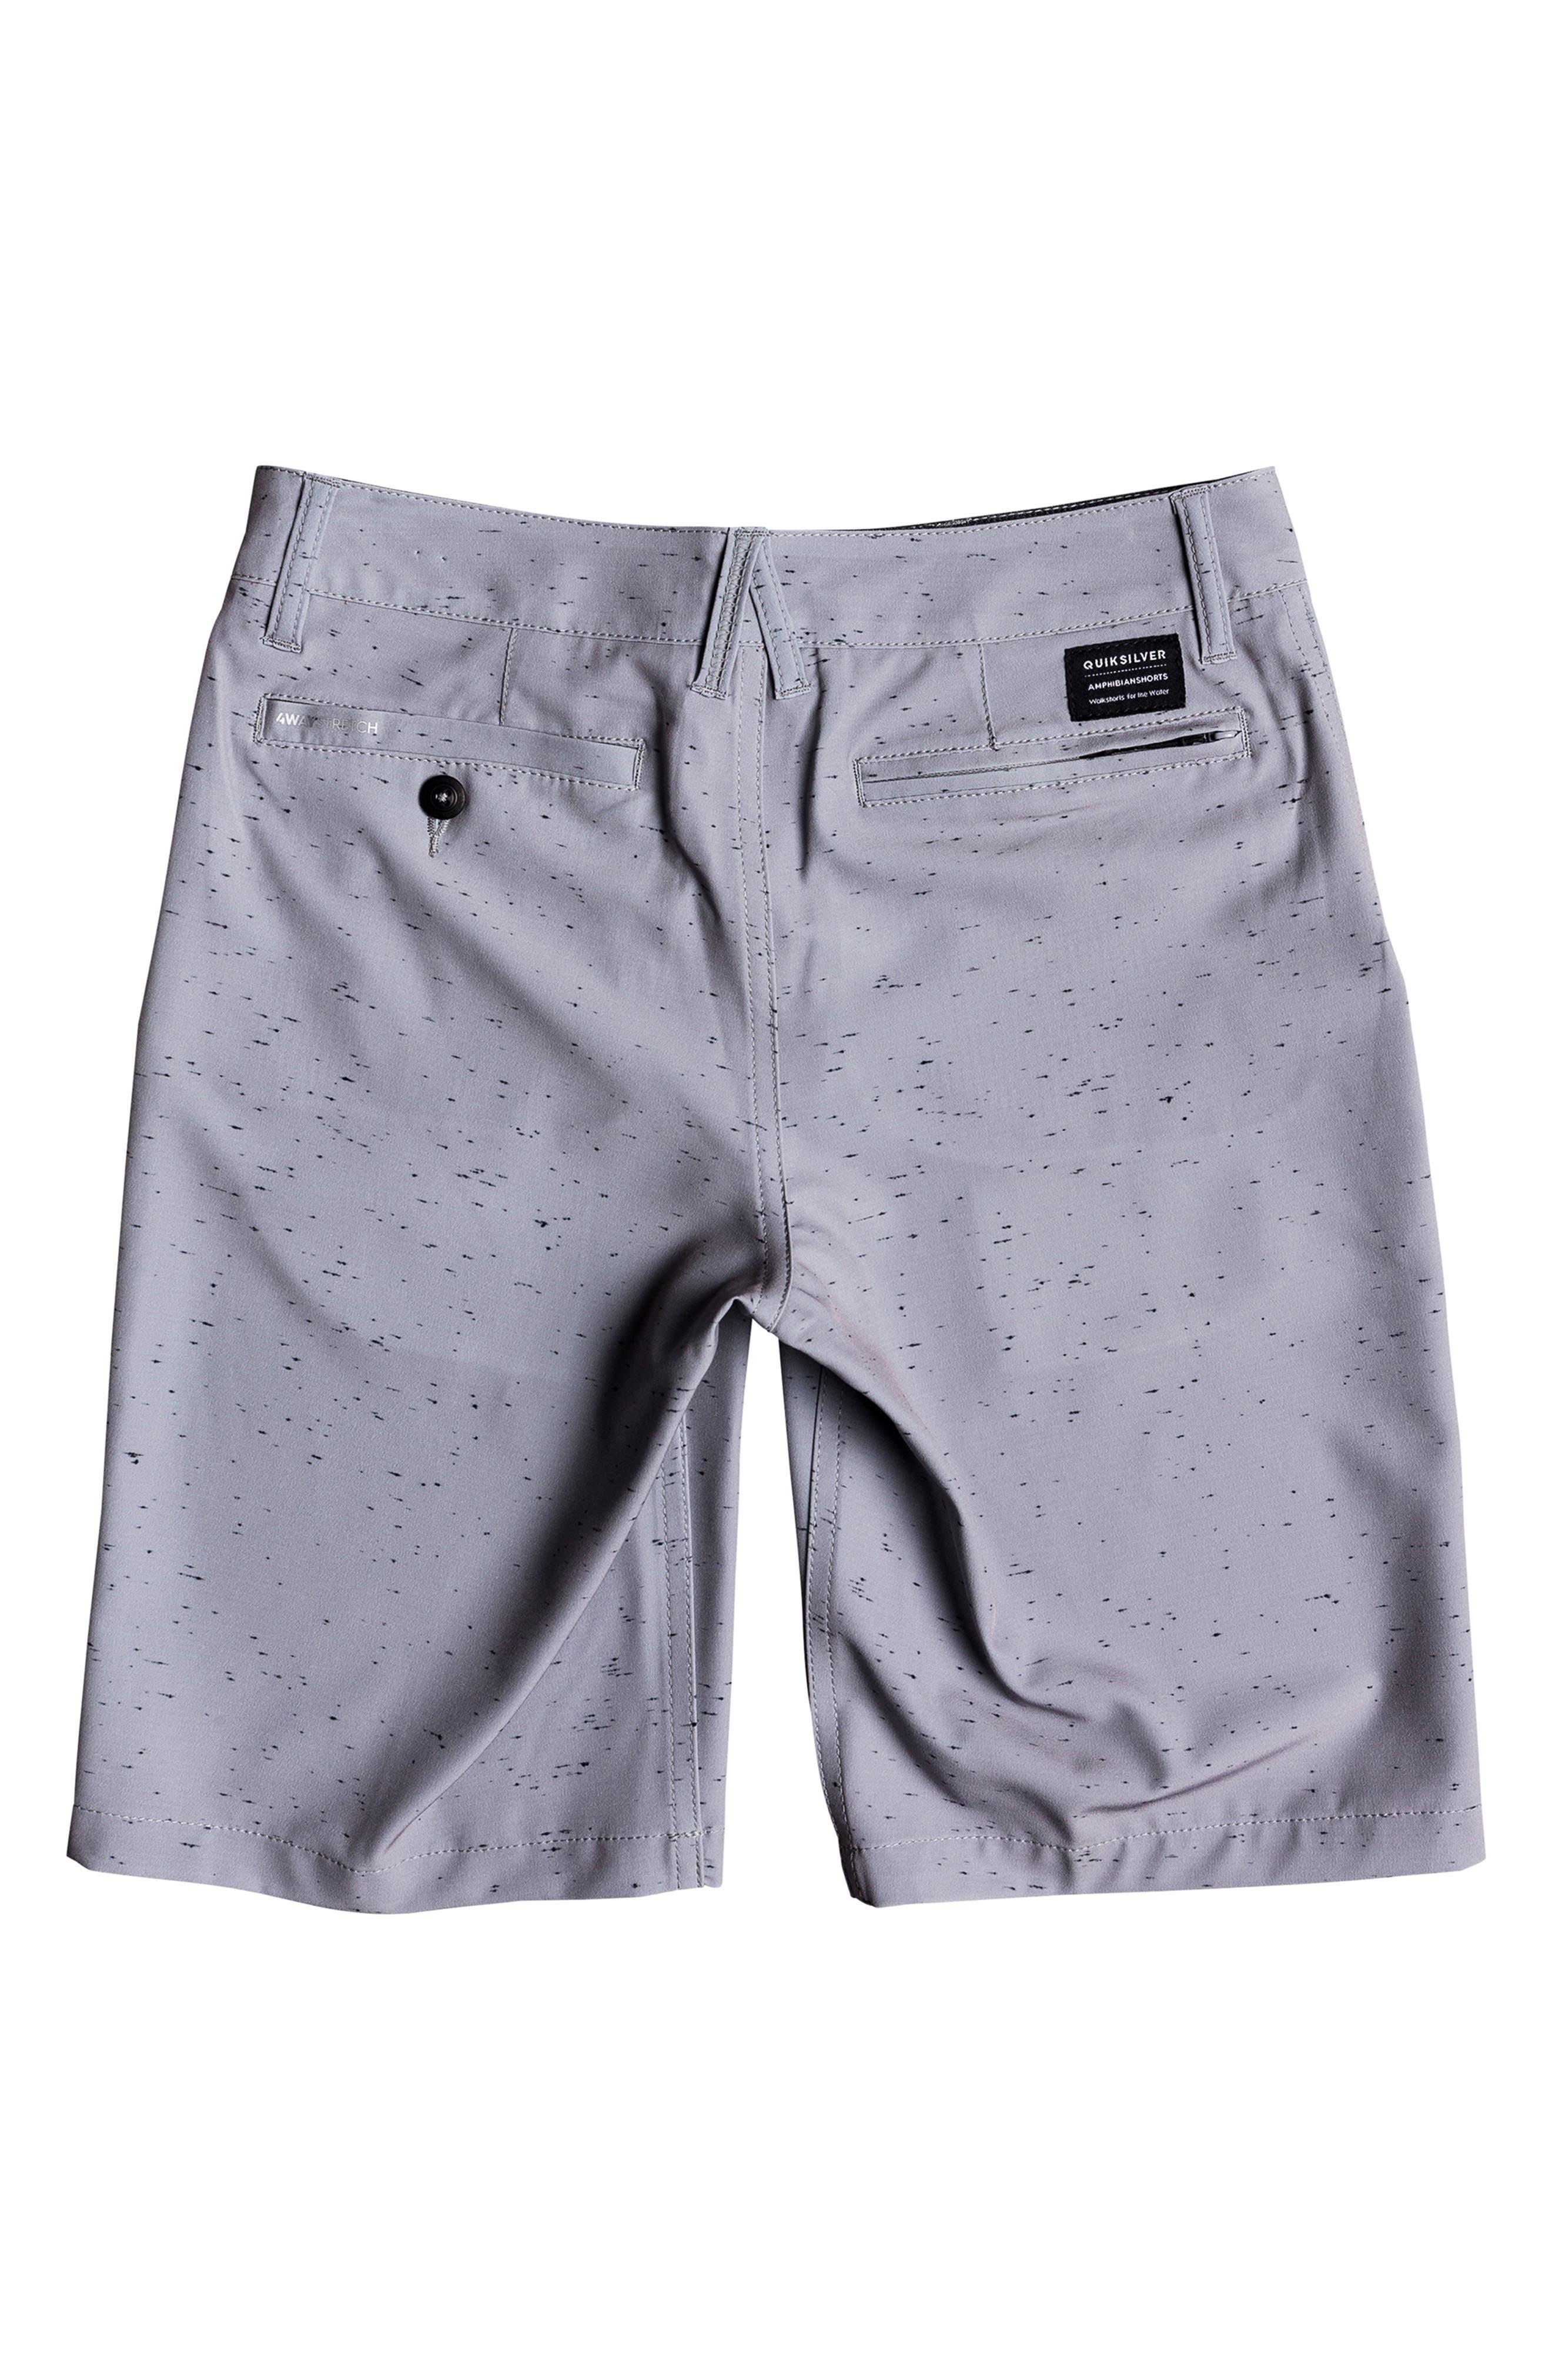 Union Nep Amphibian Hybrid Shorts,                             Alternate thumbnail 2, color,                             PLAGE